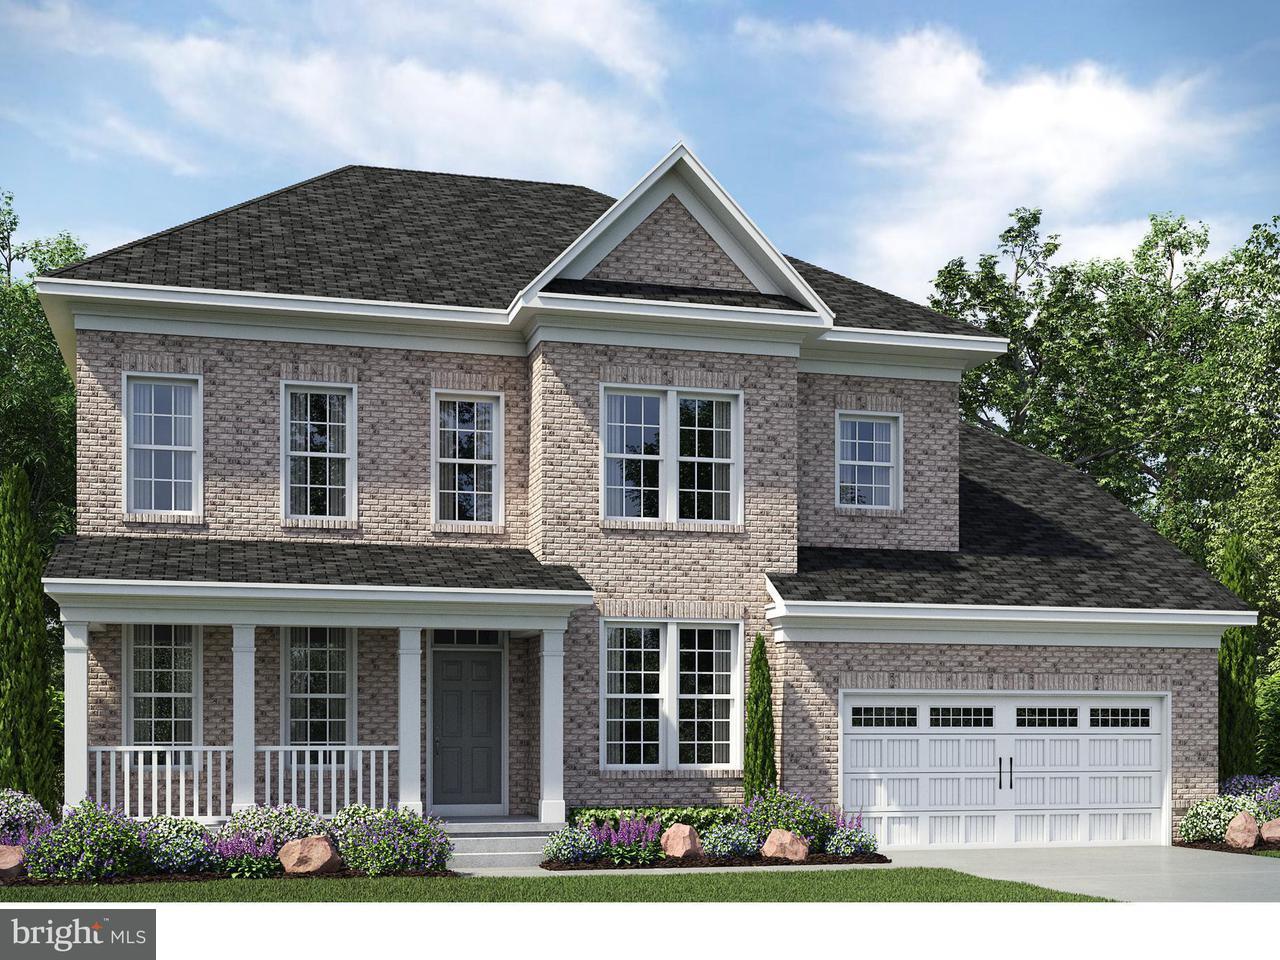 Single Family Home for Sale at Kevin Kraig Road Kevin Kraig Road Fairfax, Virginia 22030 United States